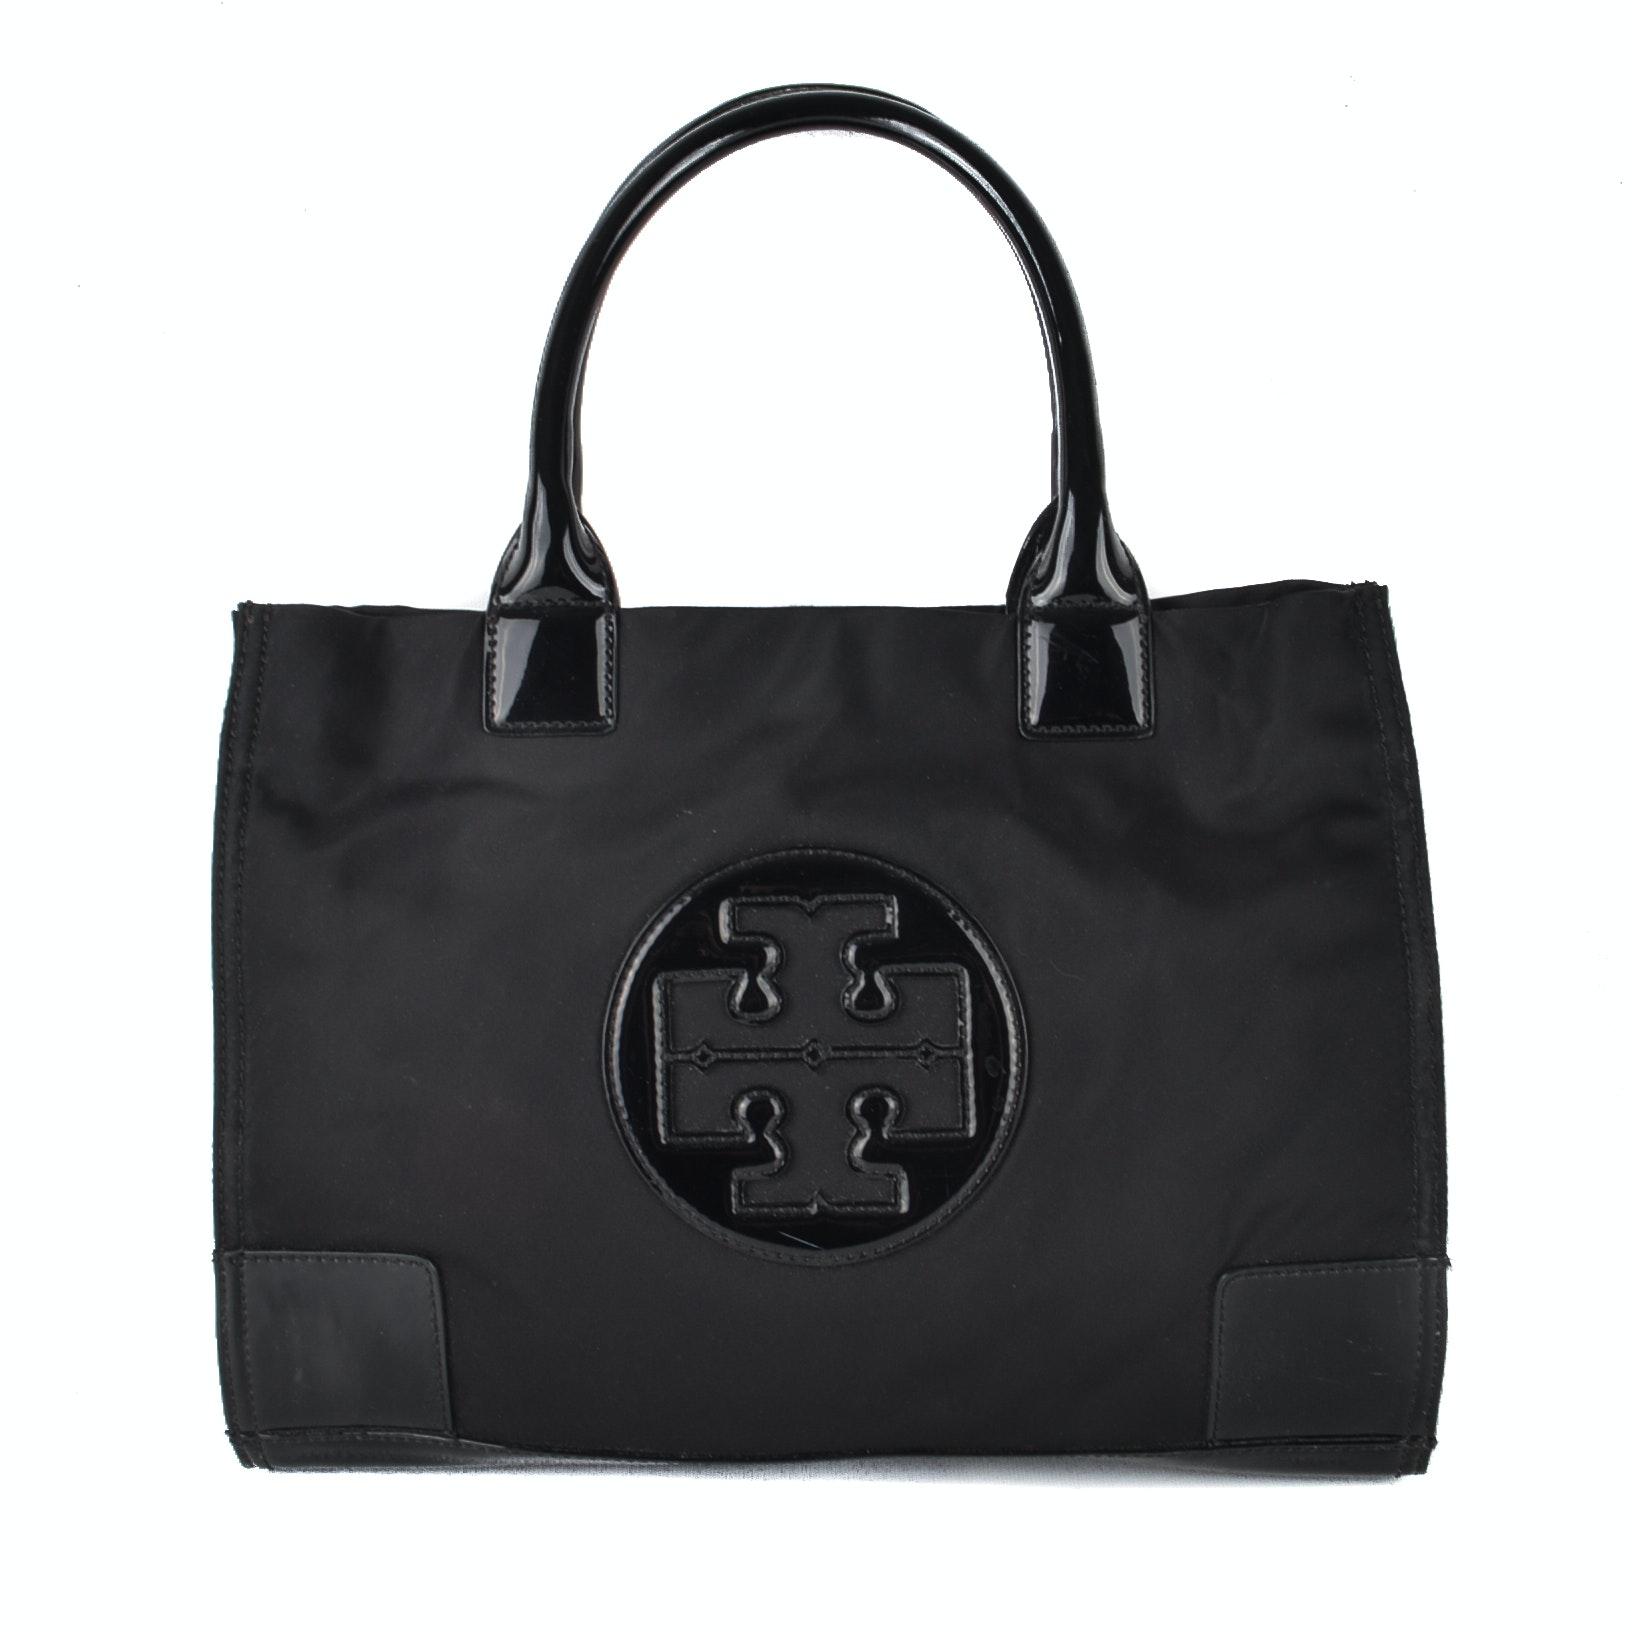 "Tory Burch Black Nylon and Patent Leather ""Ella"" Tote"